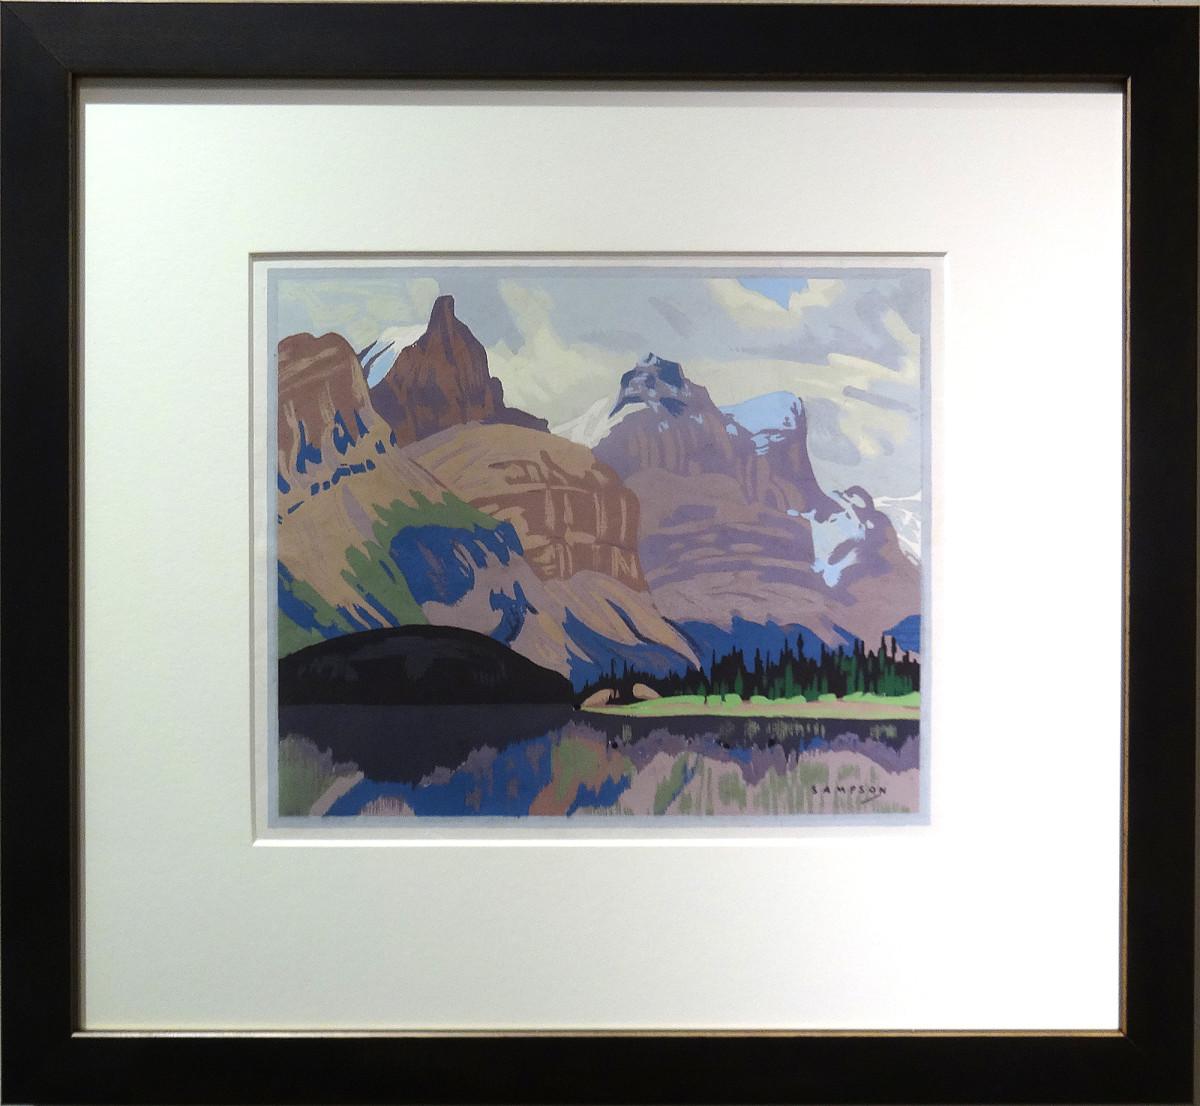 2543 - Untitled by Joseph Ernest Sampson (1887-1946)